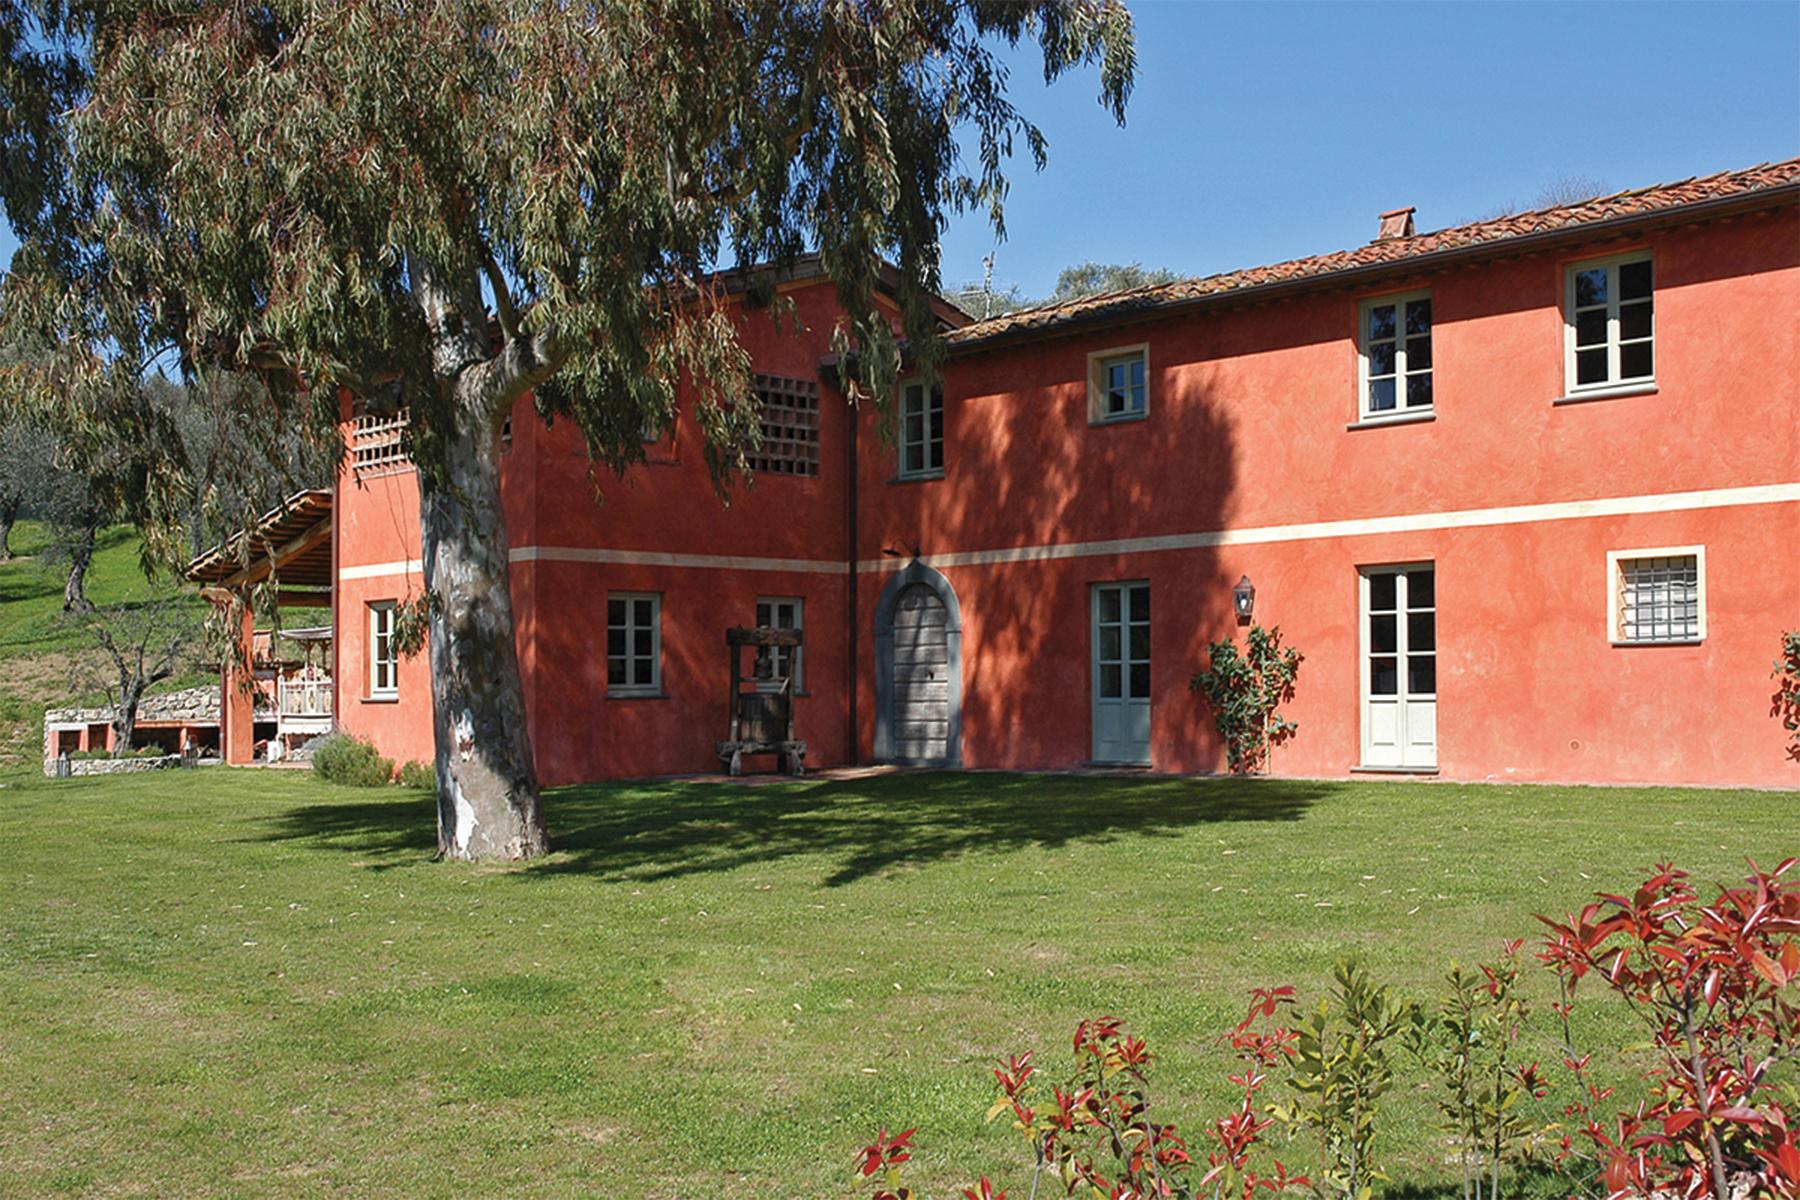 Casa indipendente in Vendita a Massarosa: 5 locali, 350 mq - Foto 3